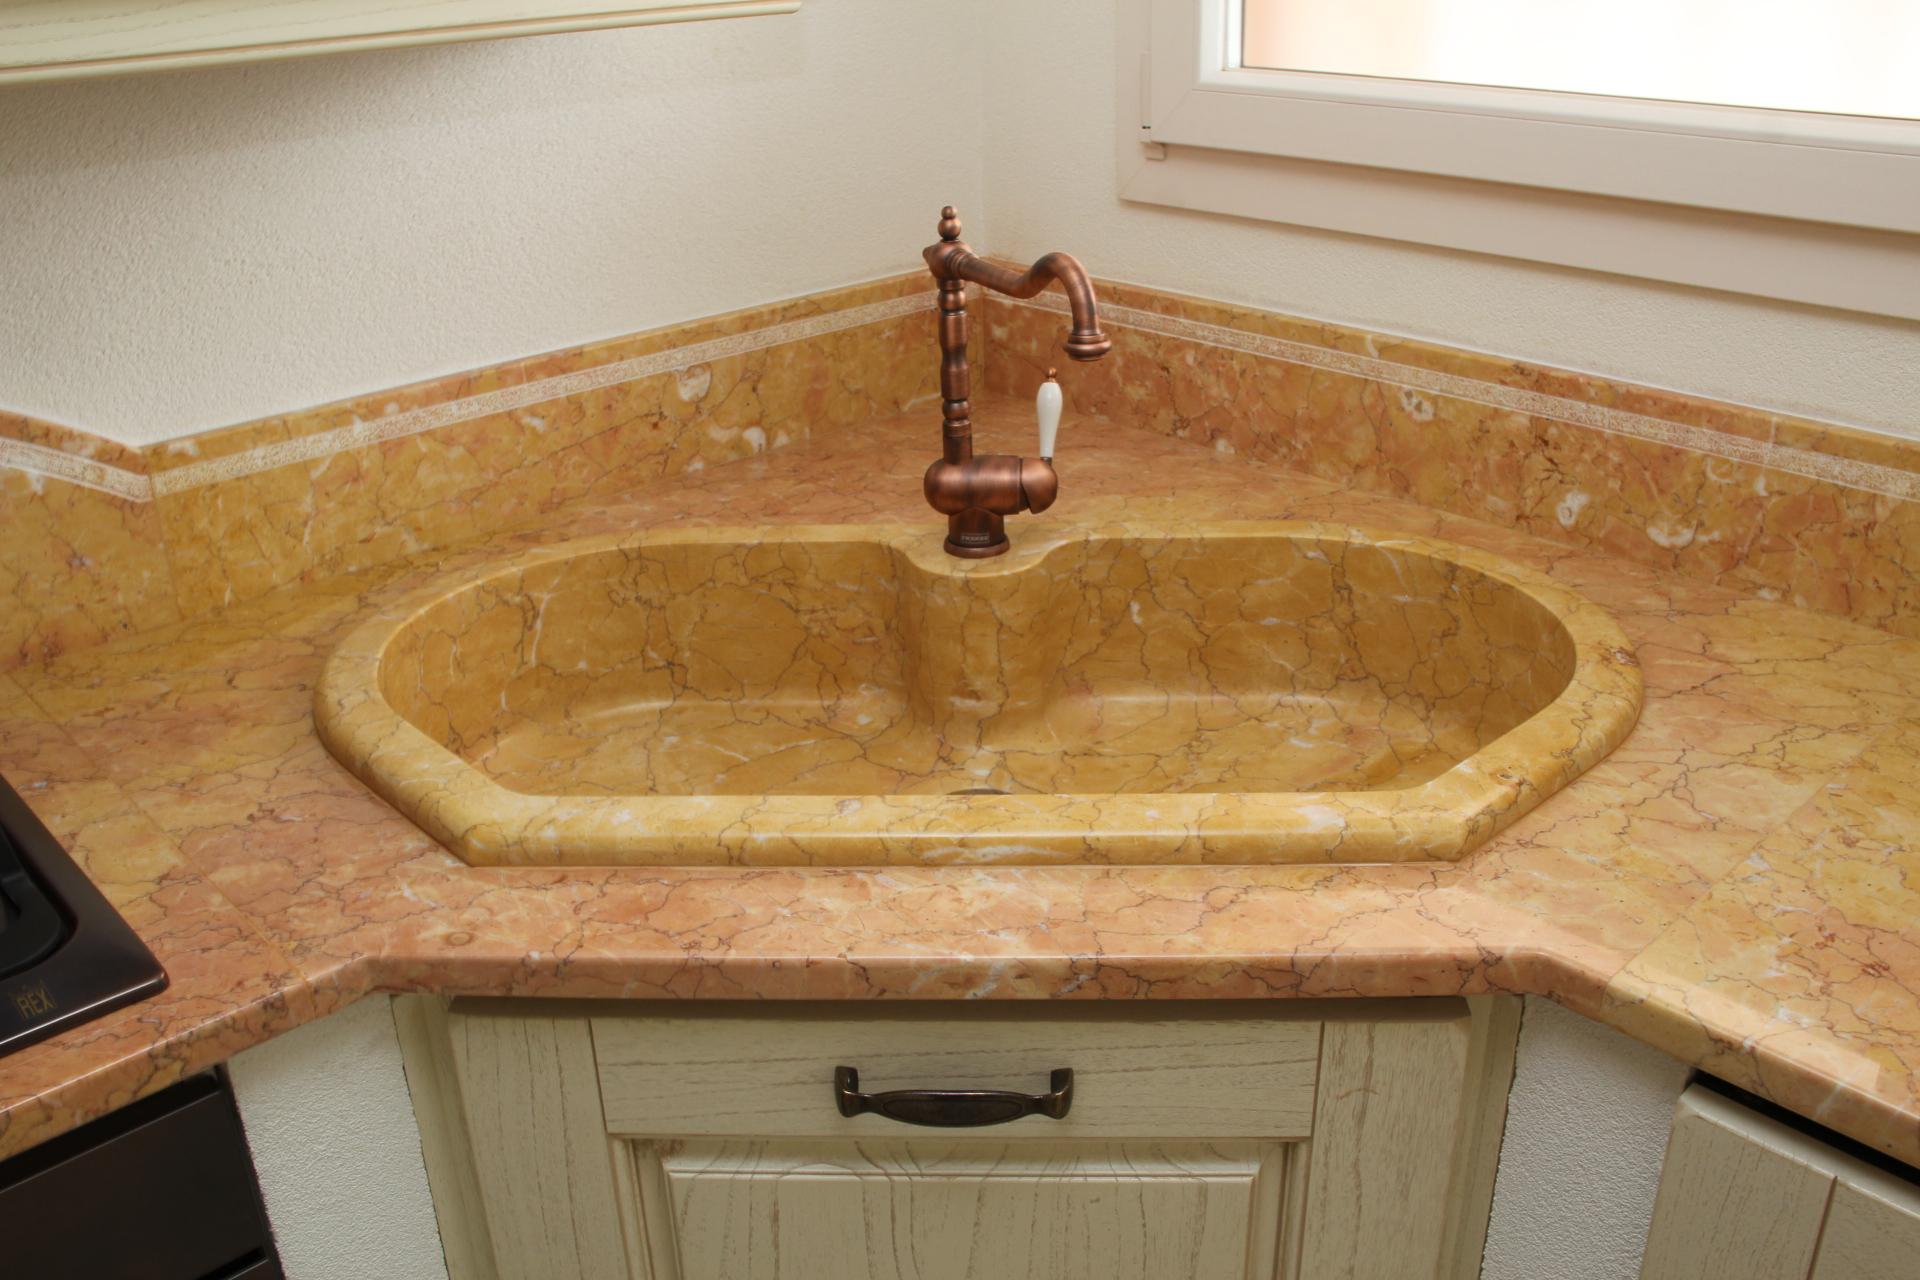 Foto piani di cucina in marmo e pietra vendute a prezzi affare - Lavandini in marmo per cucina ...